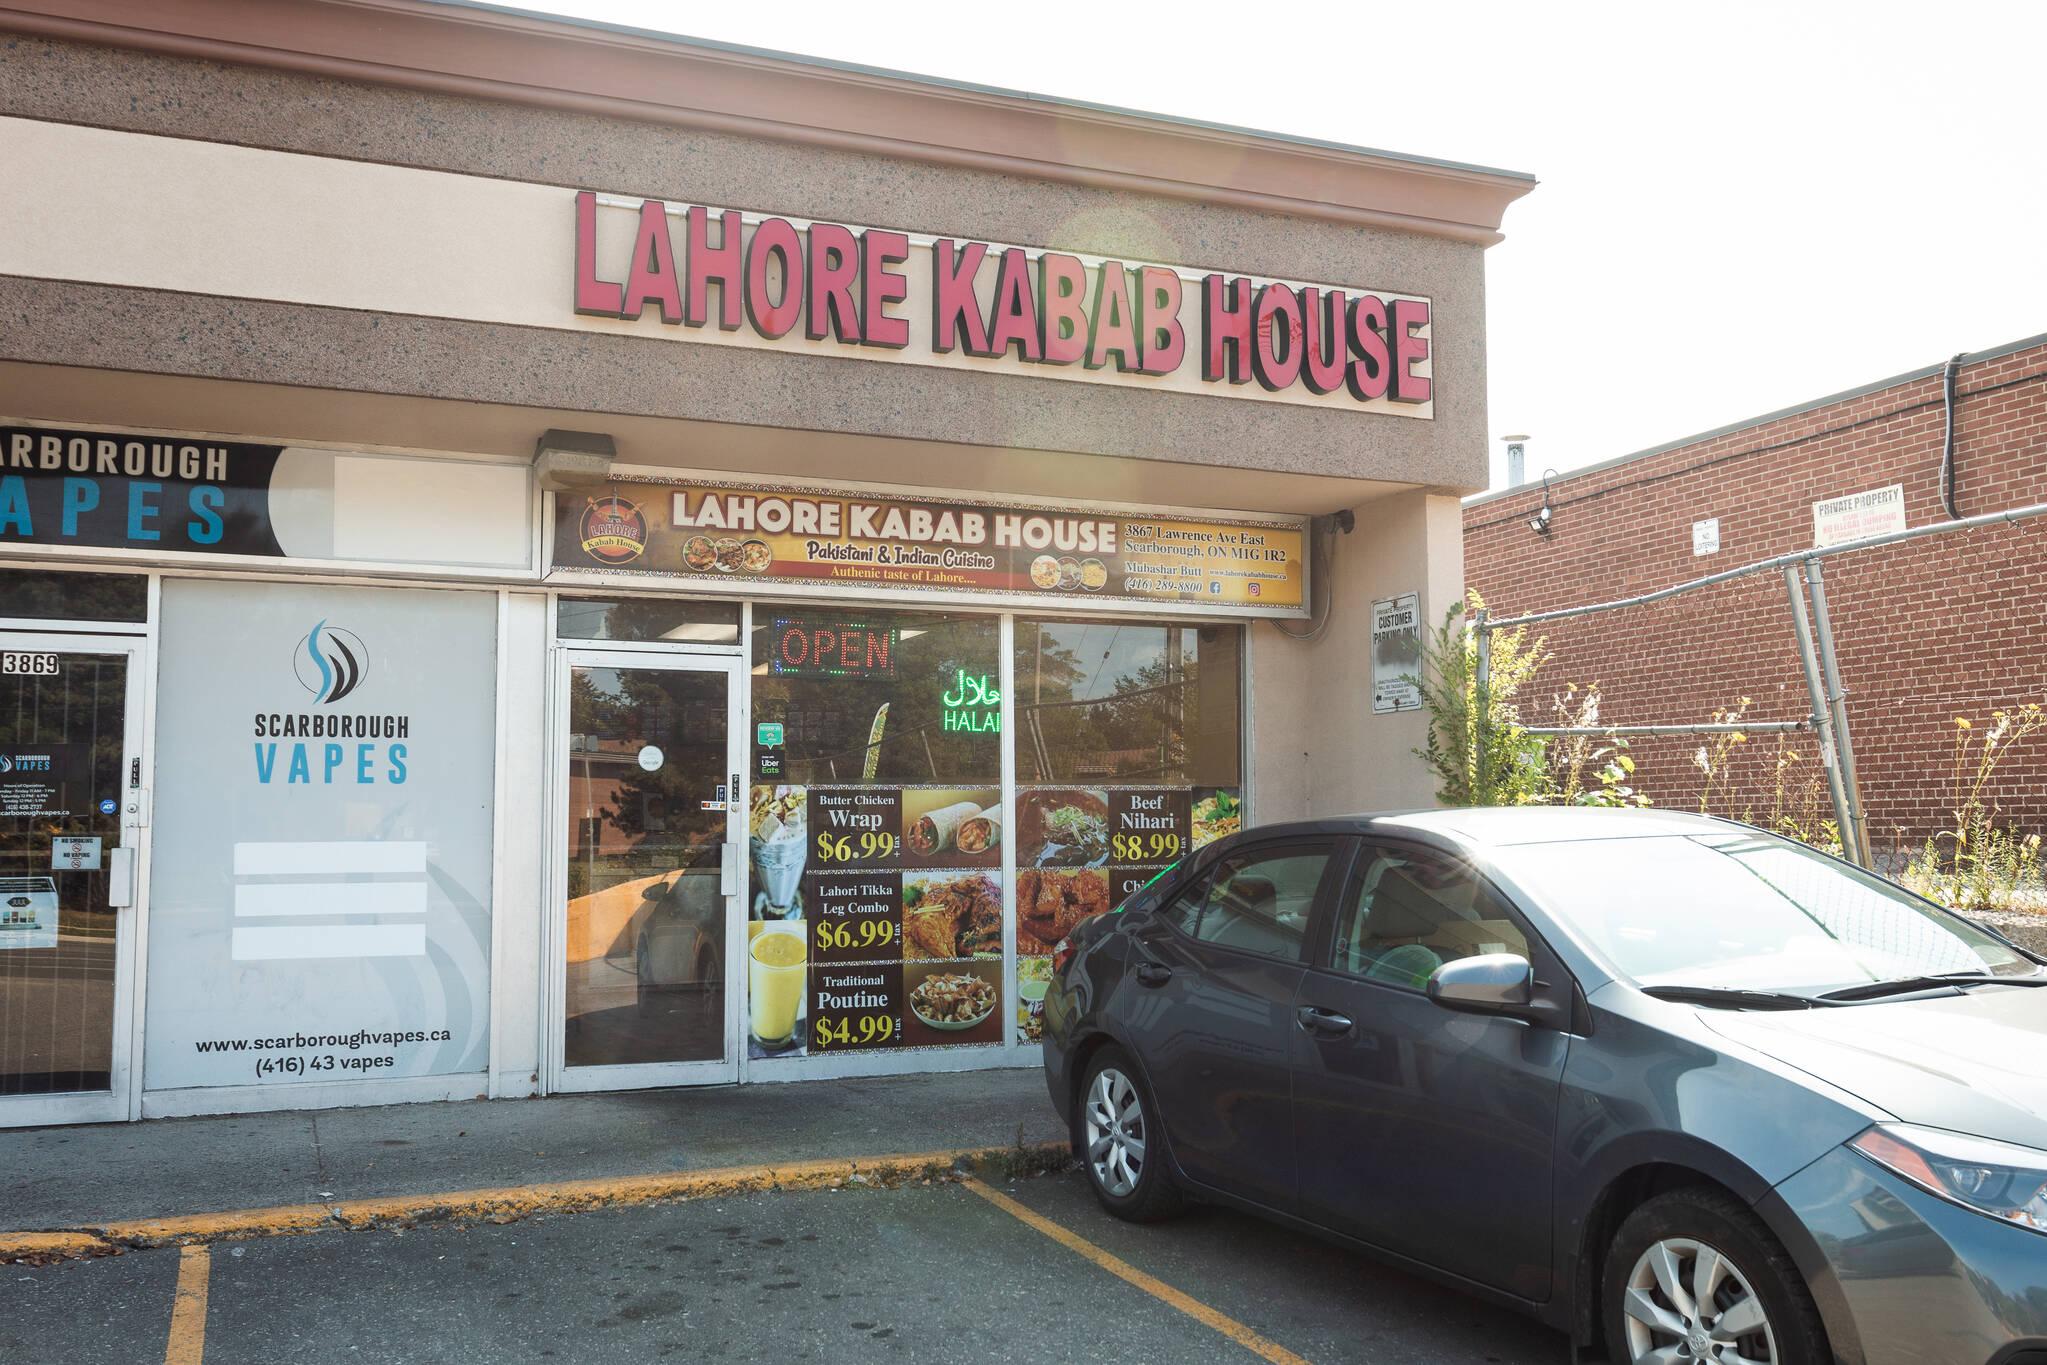 Lahore Kabab House Toronto